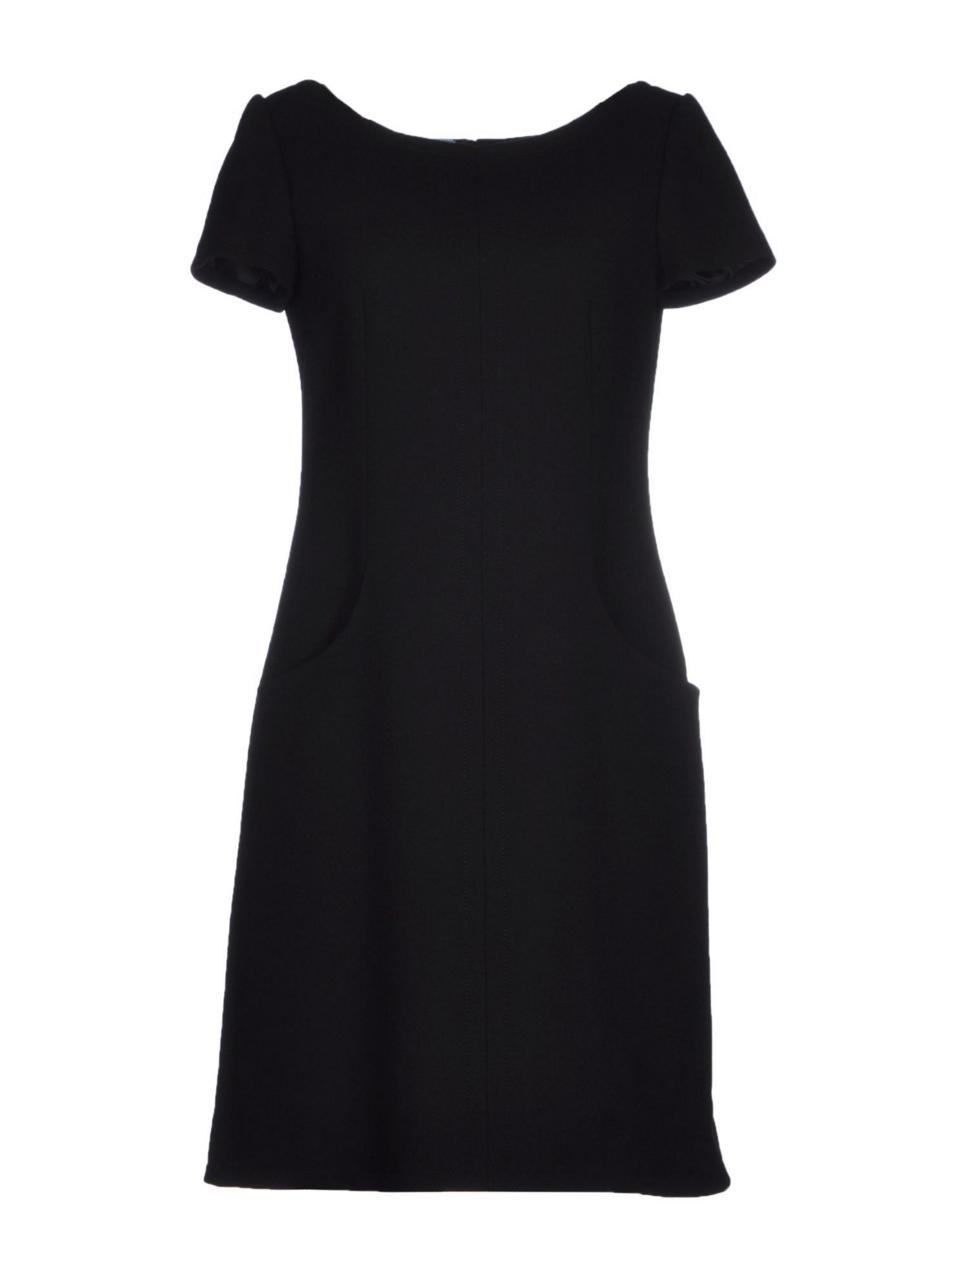 Prada Wool Short Dress Pockets.png